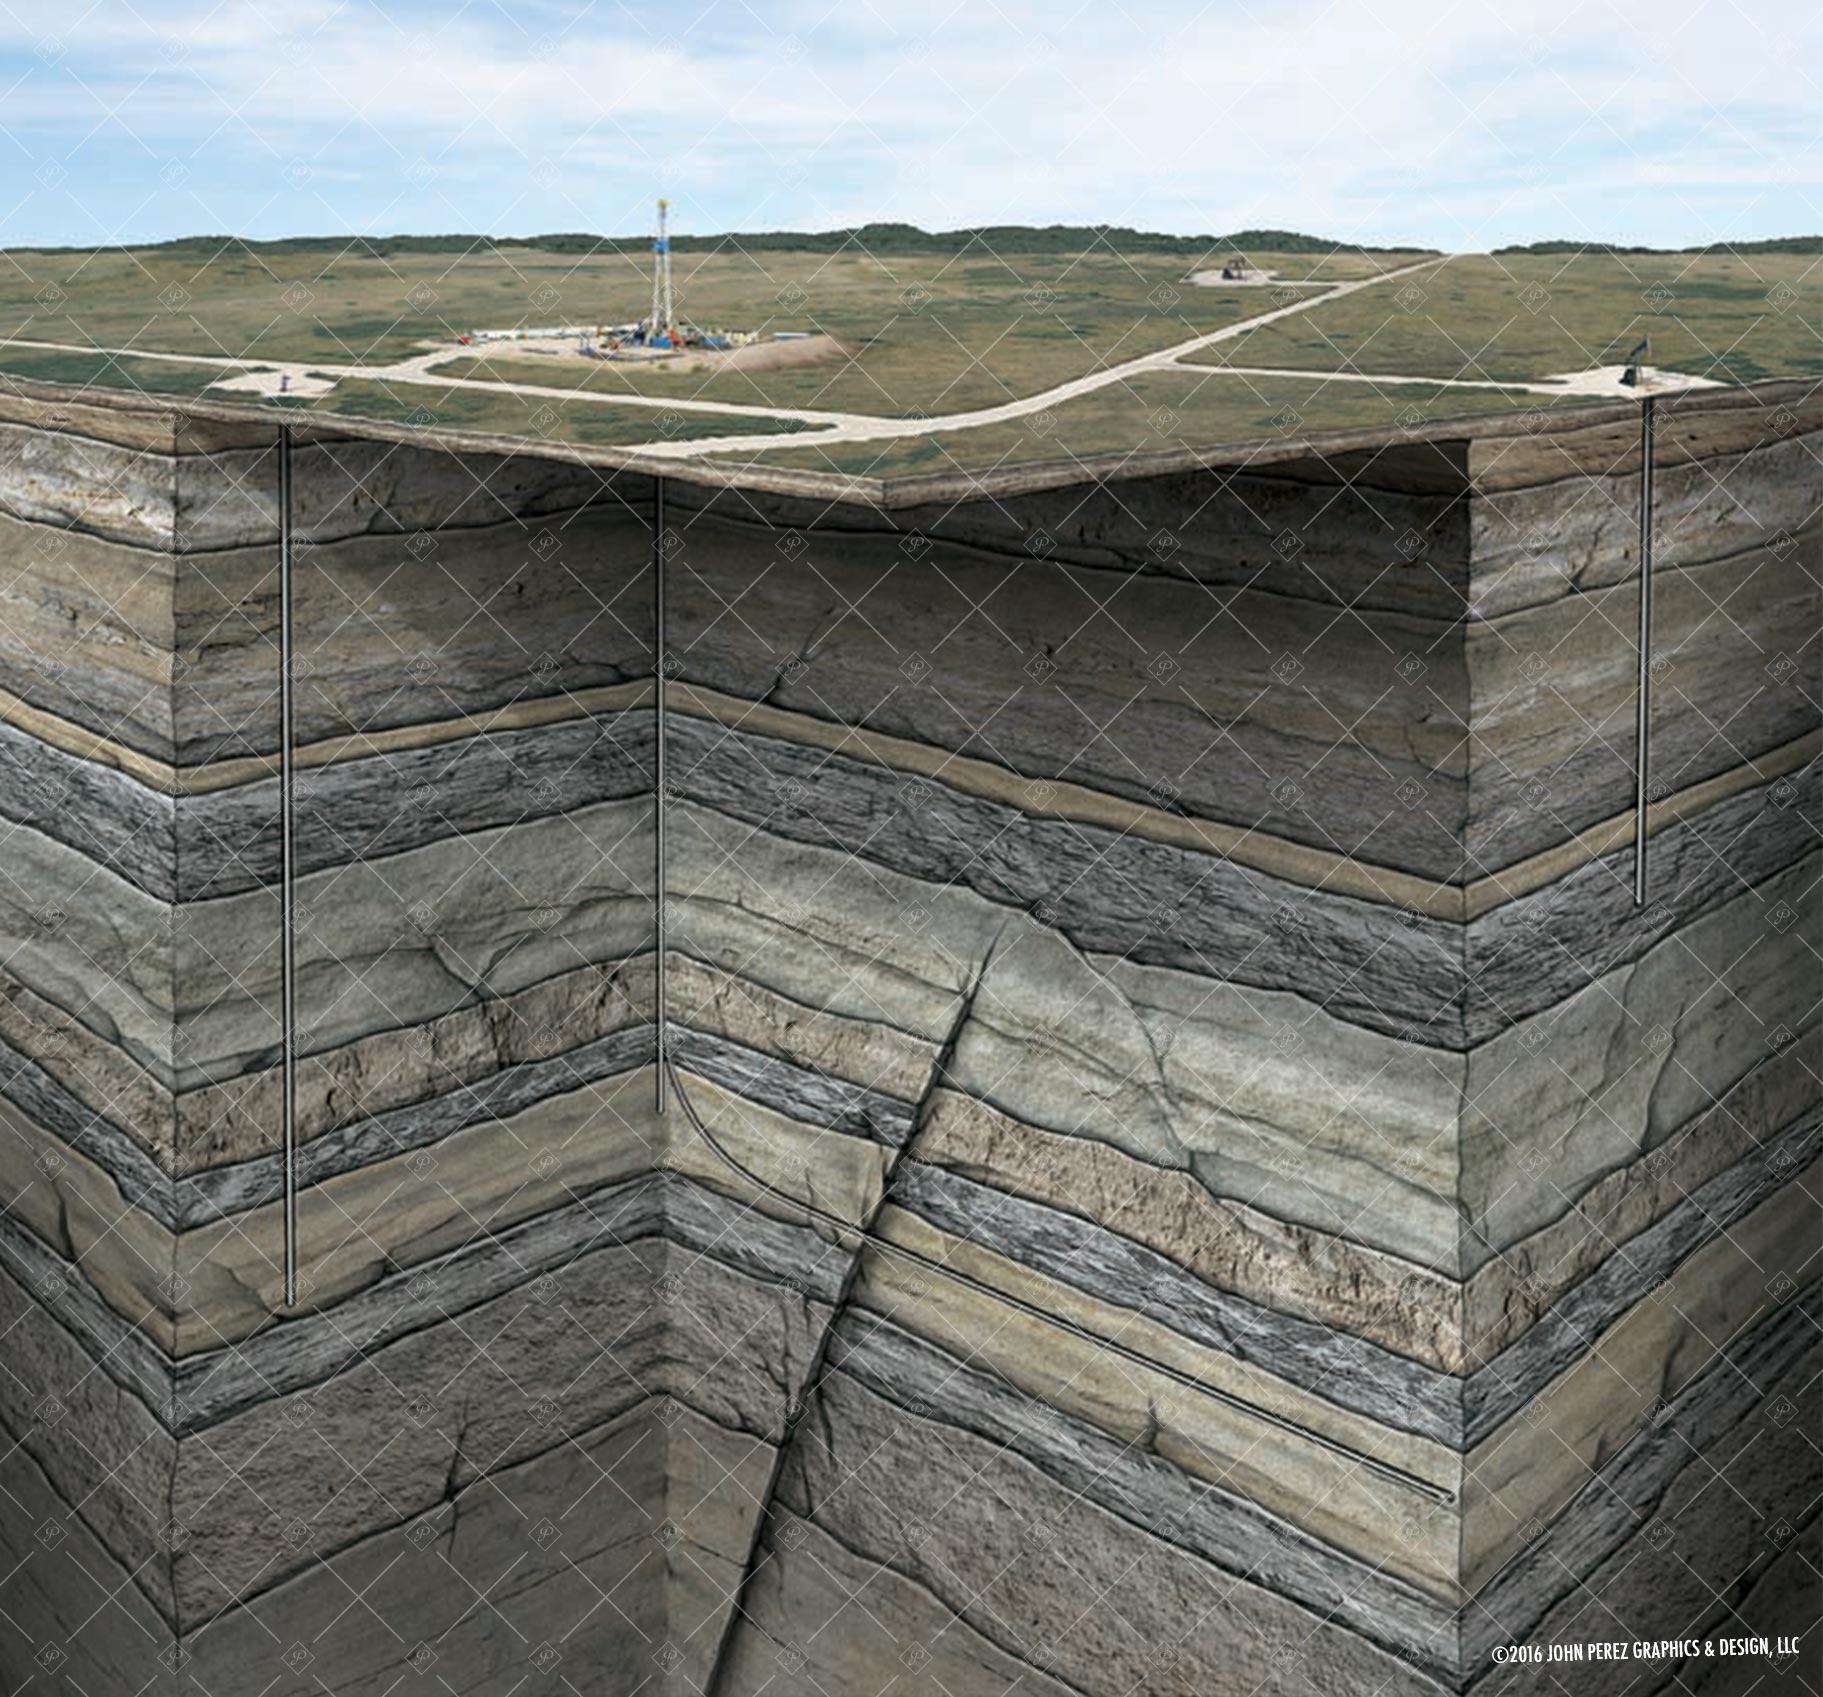 Vertical Horizontal Drilling Comparison Schematic, oil and gas graphics, oil and gas schematics